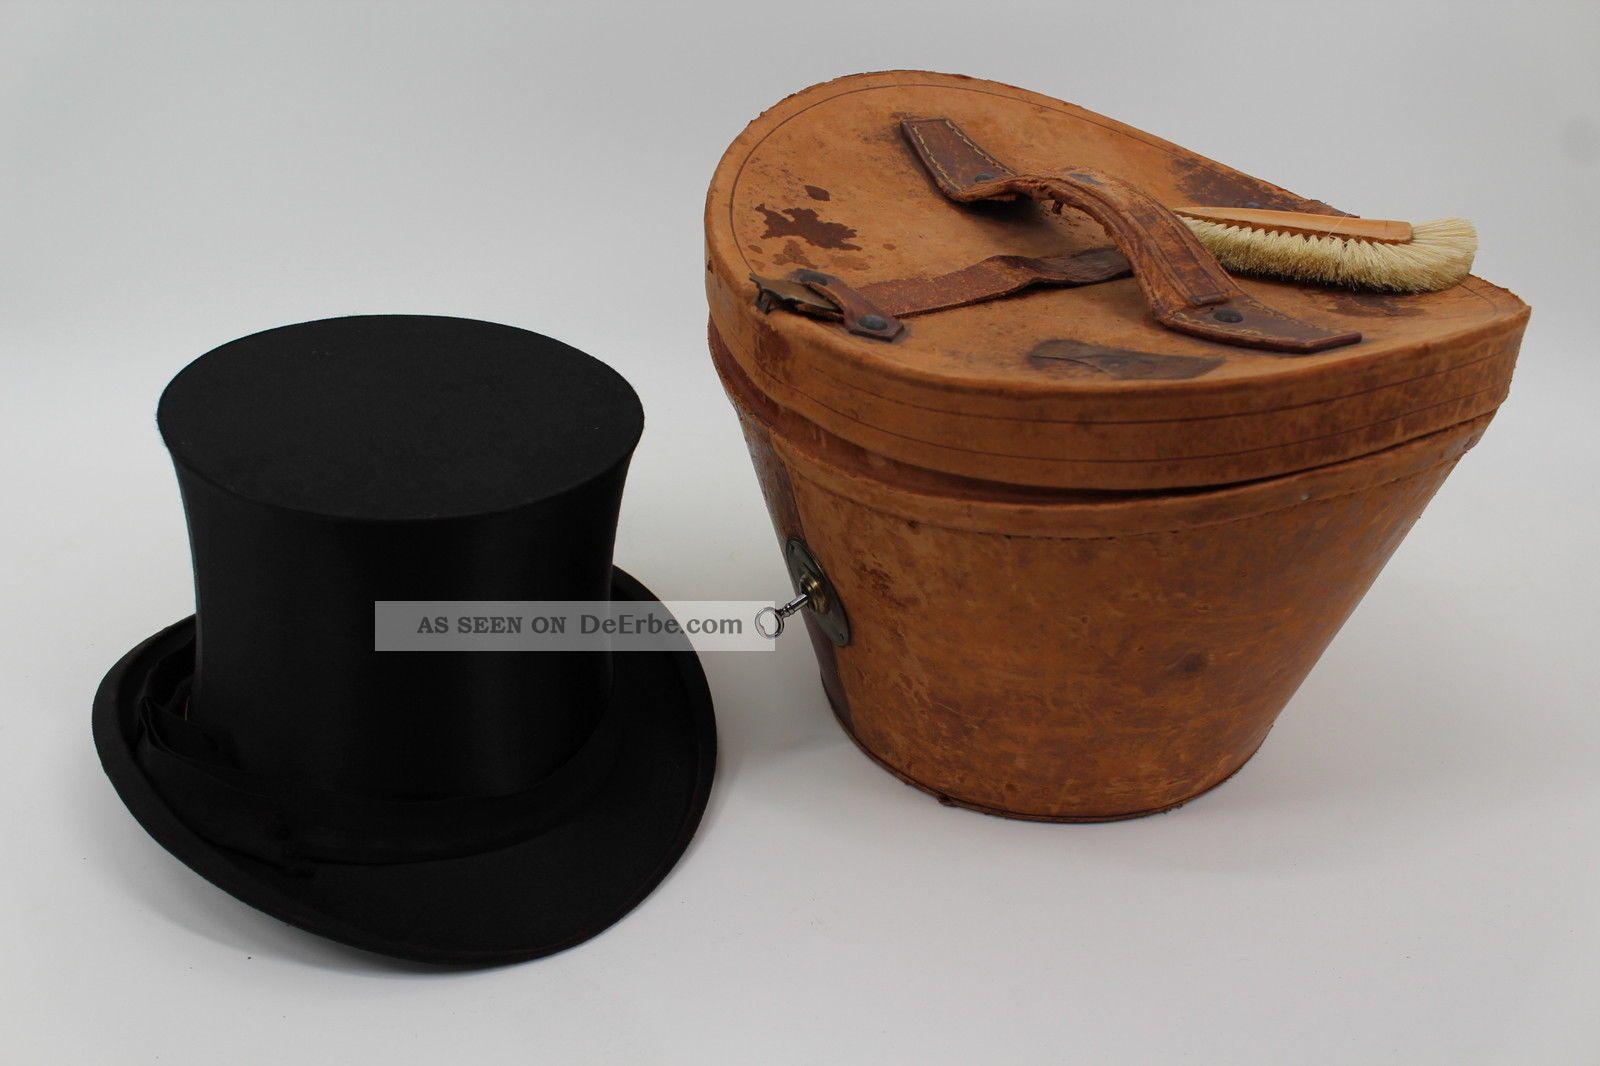 Antiker Zylinder Mit Passender Lederschachtel 1910 Jugendstil Heilbronn Accessoires Bild